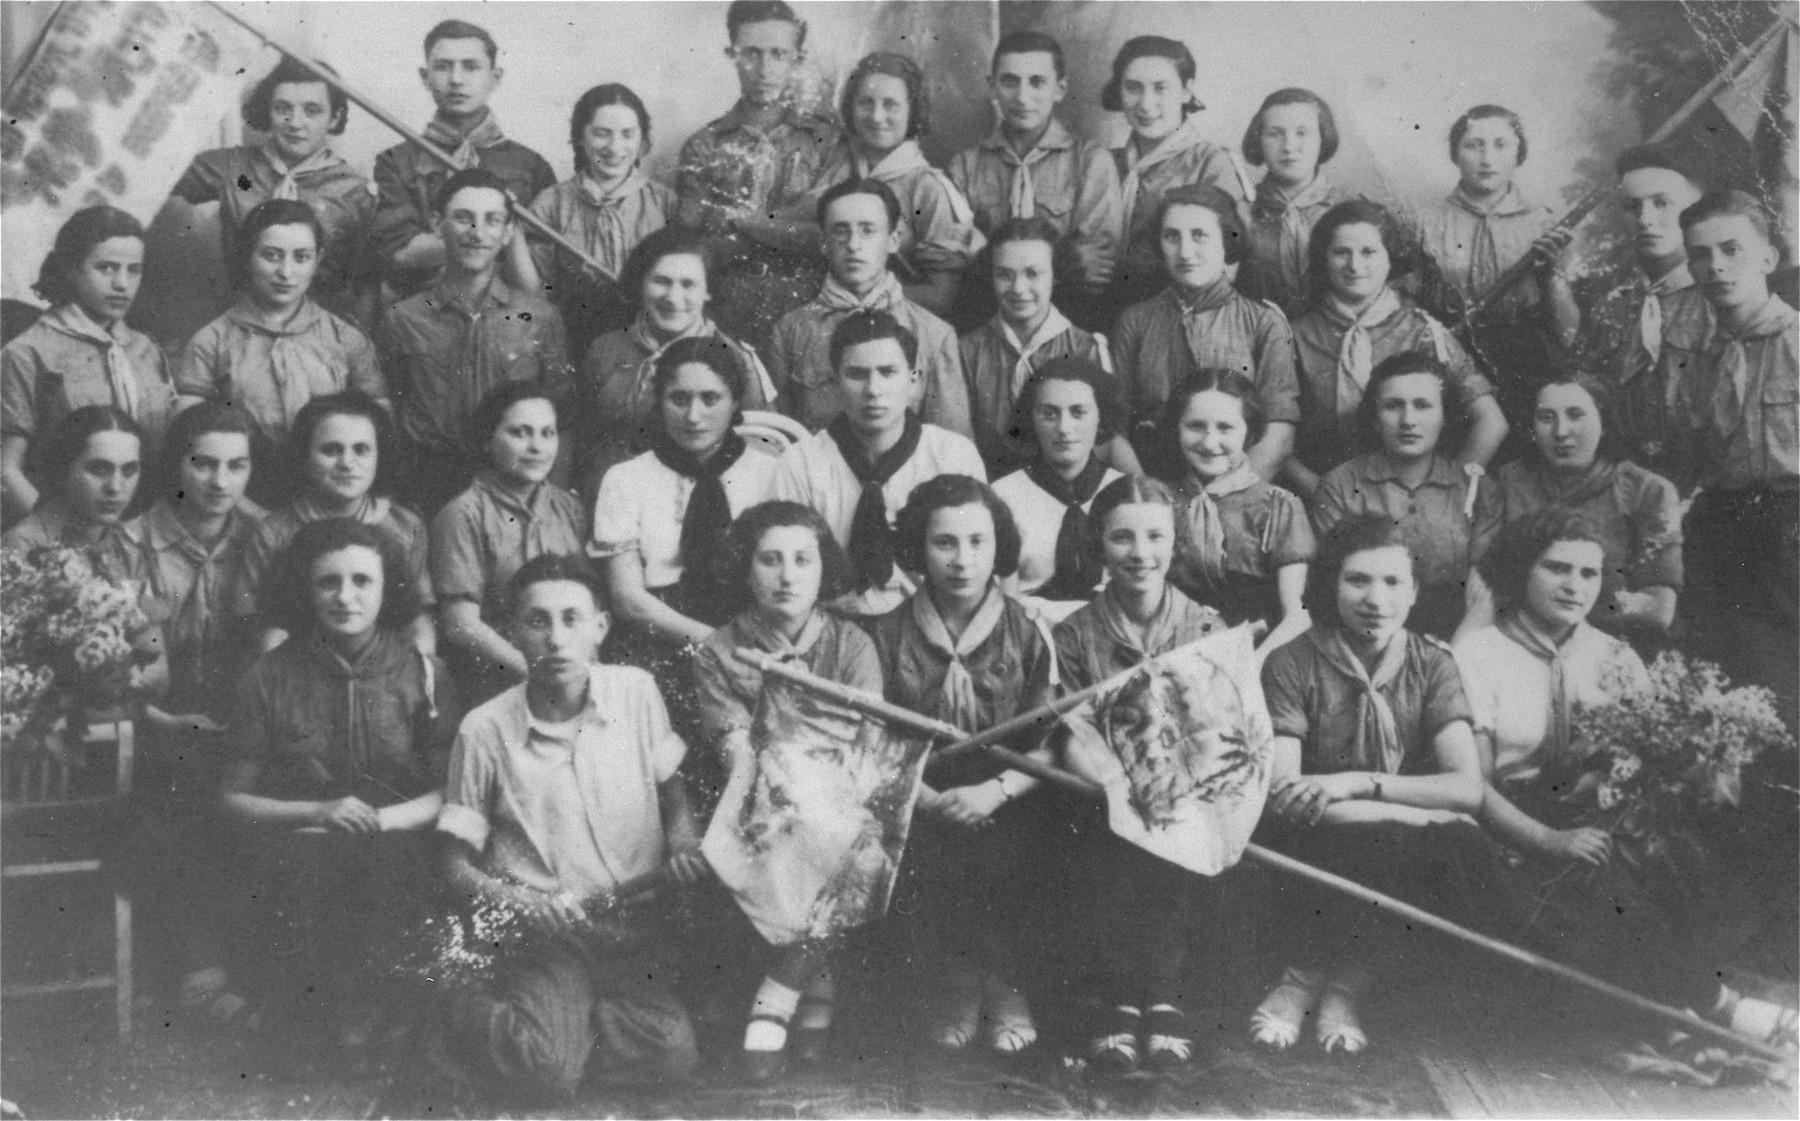 Group portrait of members of the Hashomer Hatzair Zionist youth movement in Ciechanow, Poland, among them Roza Robota.    Pictured from left to right are: Front row: Makovska, Johevet Aurbach, Mondrzak, Regina Mysior, Srebnagora and Lea Altus. Second row: Hinda Lindenberg, unknown, Gitel Kahane, Hinda Kahane, Malka Leventhal, Aba Garfinkle, Ryvka Inwentarz, Pschulka, Lea Schultz and Lea Kirshenbaum. Third row: Makowska, unknown, unknown, Roza Robota, Mileh Zilberstrom, Ruth Kirshenzweig, Malka Shtippenholtz, unknown, unknown and Libel Gogol.  Top row: Pazgorek, Shepsel Galek, Fella Brash, Moishe Schlesinger, Hella Garfinkle, unidentified, Sara Robota, Esther Kostrzeva and Seeza Bronstein.